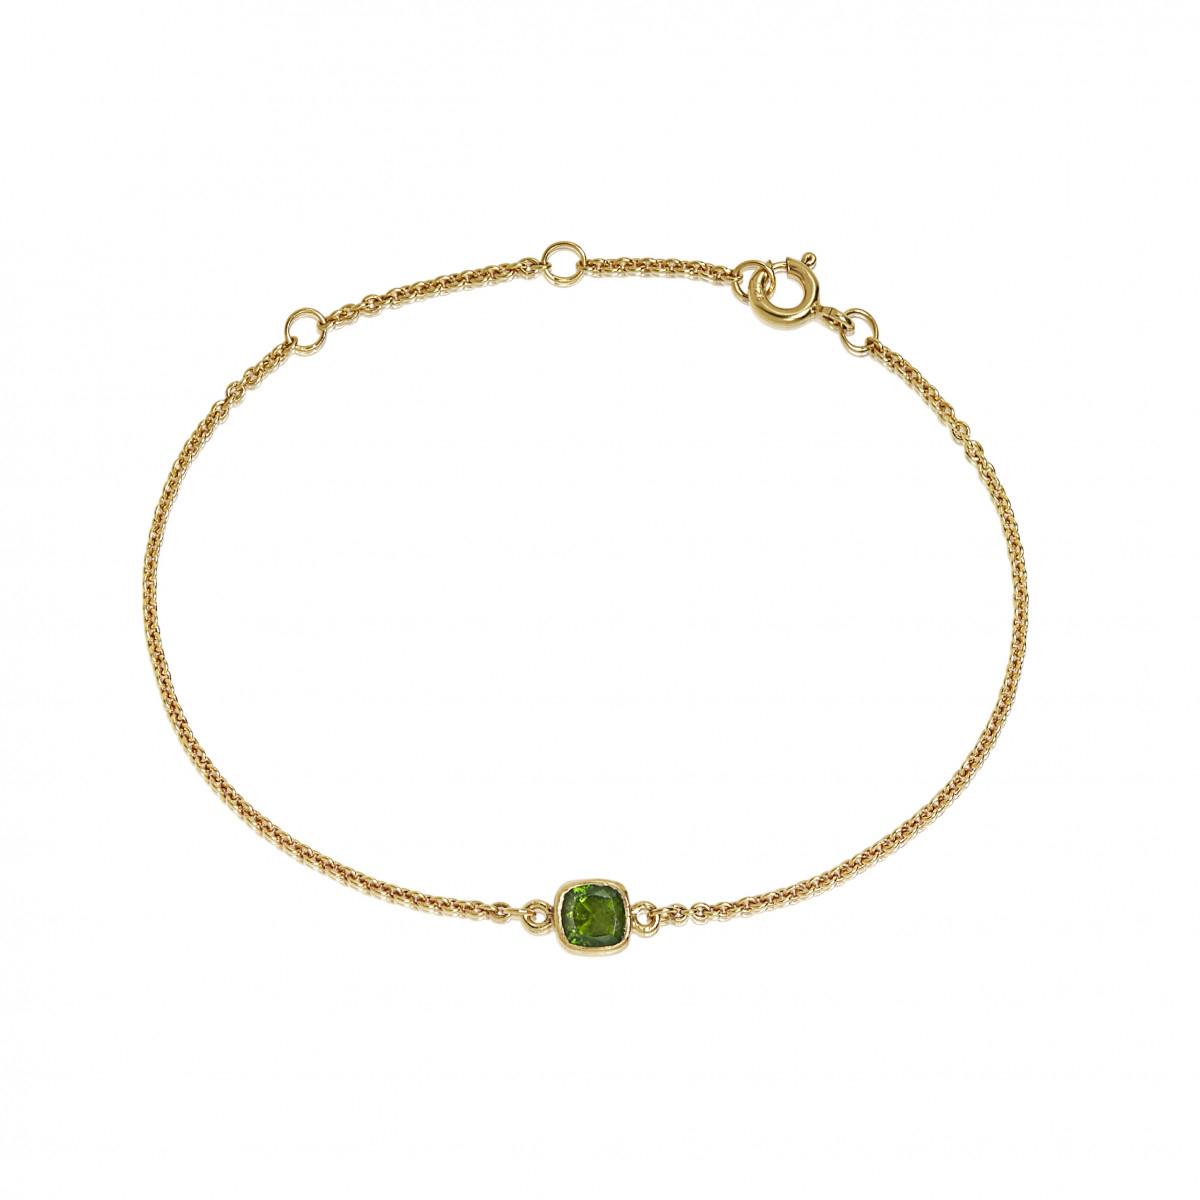 Image of   Carré forgyldt armbånd med grøn Chrom Diopsid